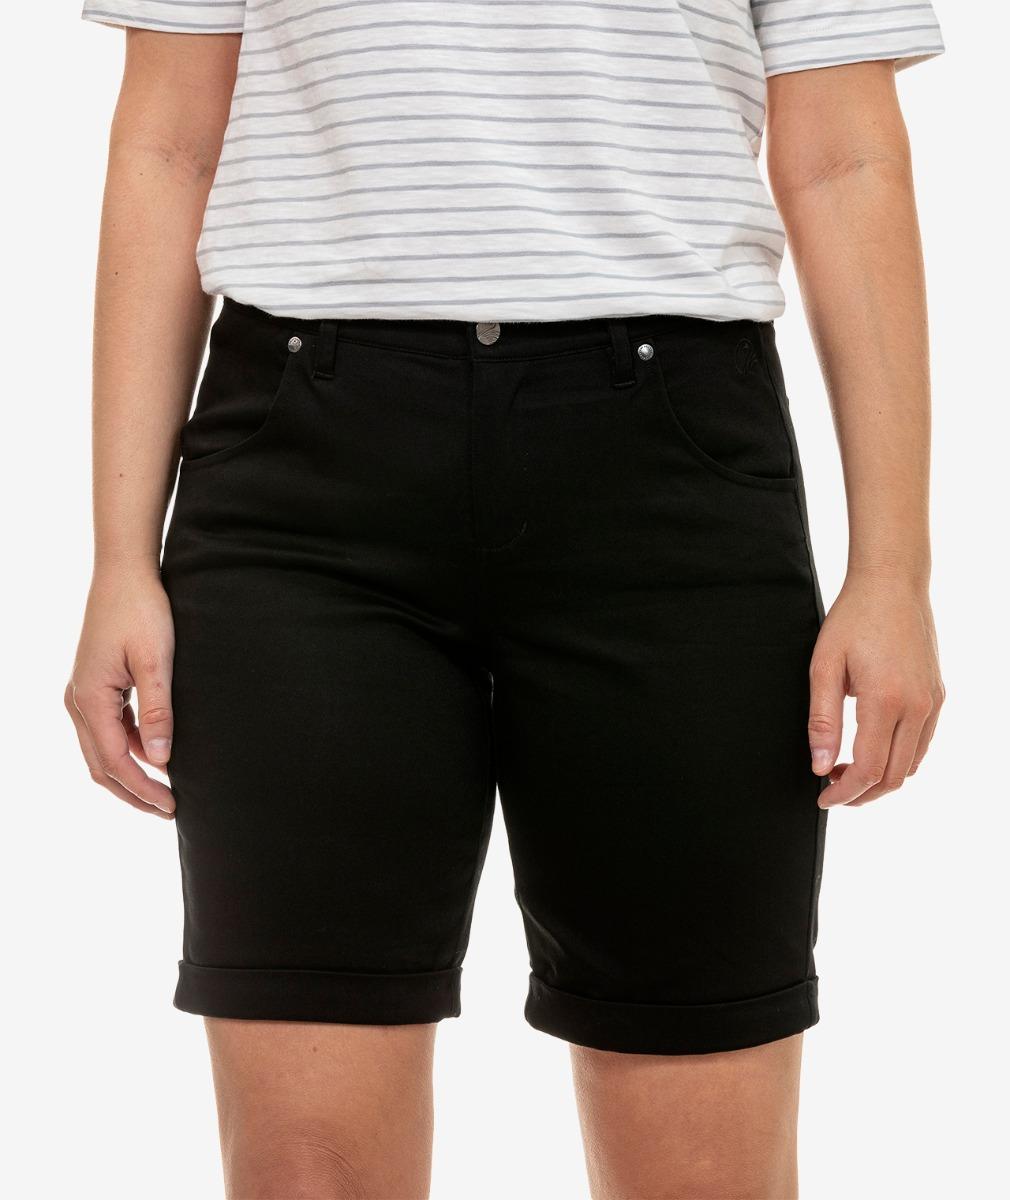 Swanndri Women's Waverley Super Stretch Short